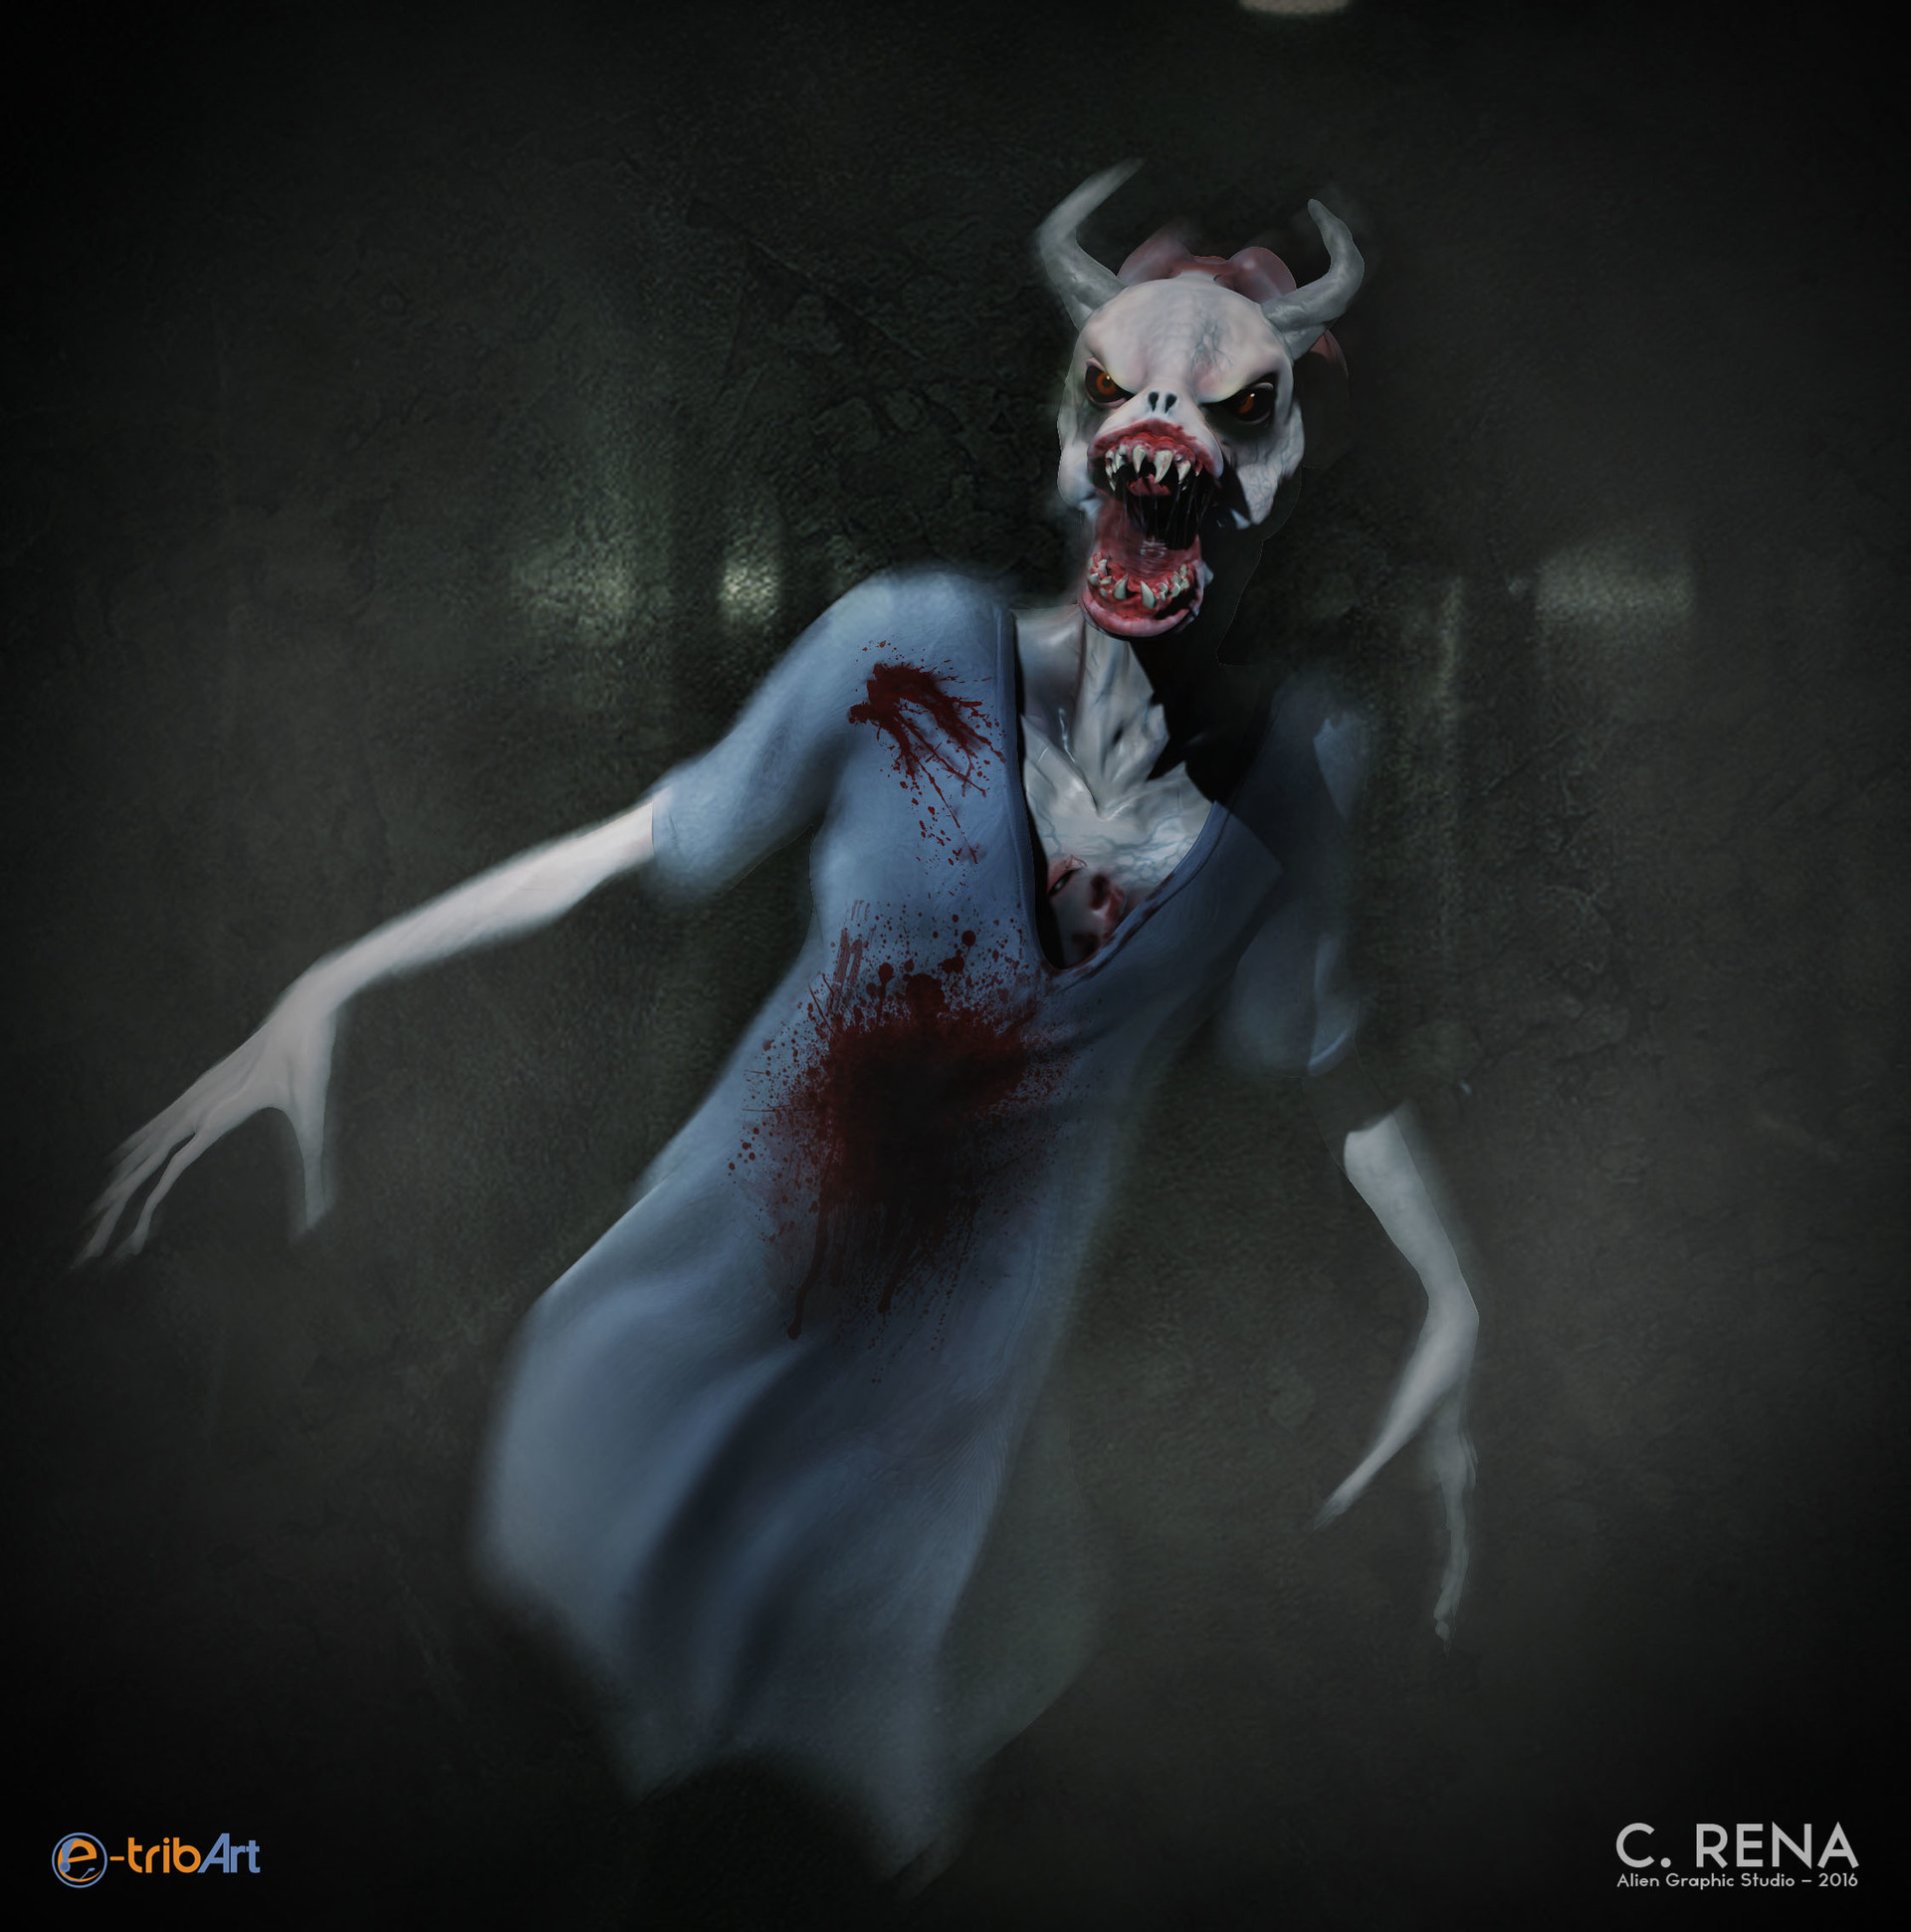 Chris rena hospital demon comp final